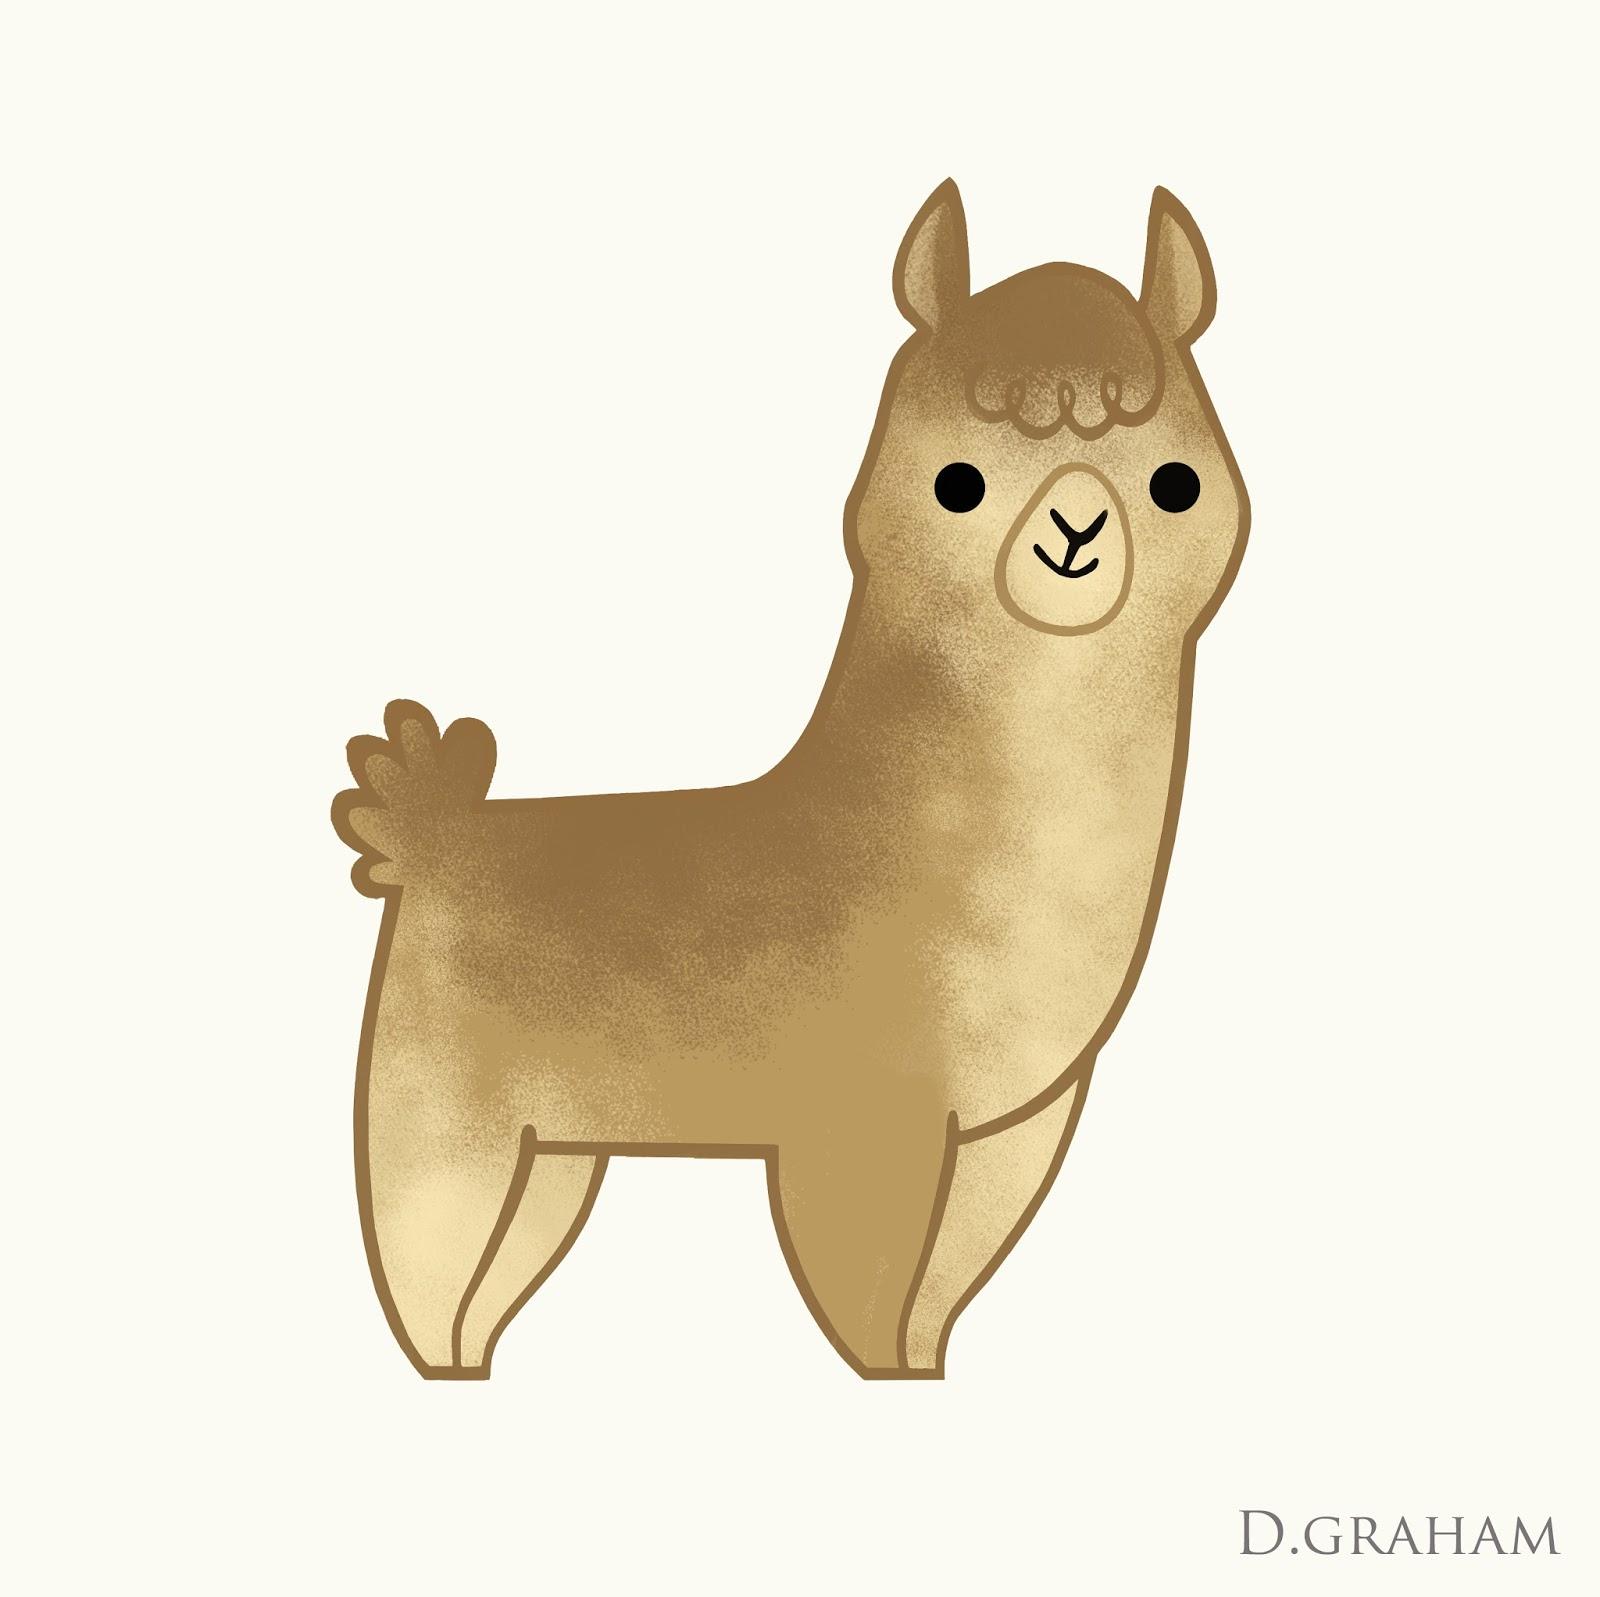 Drawn alpaca Pencil Drawing Alpaca Images Art